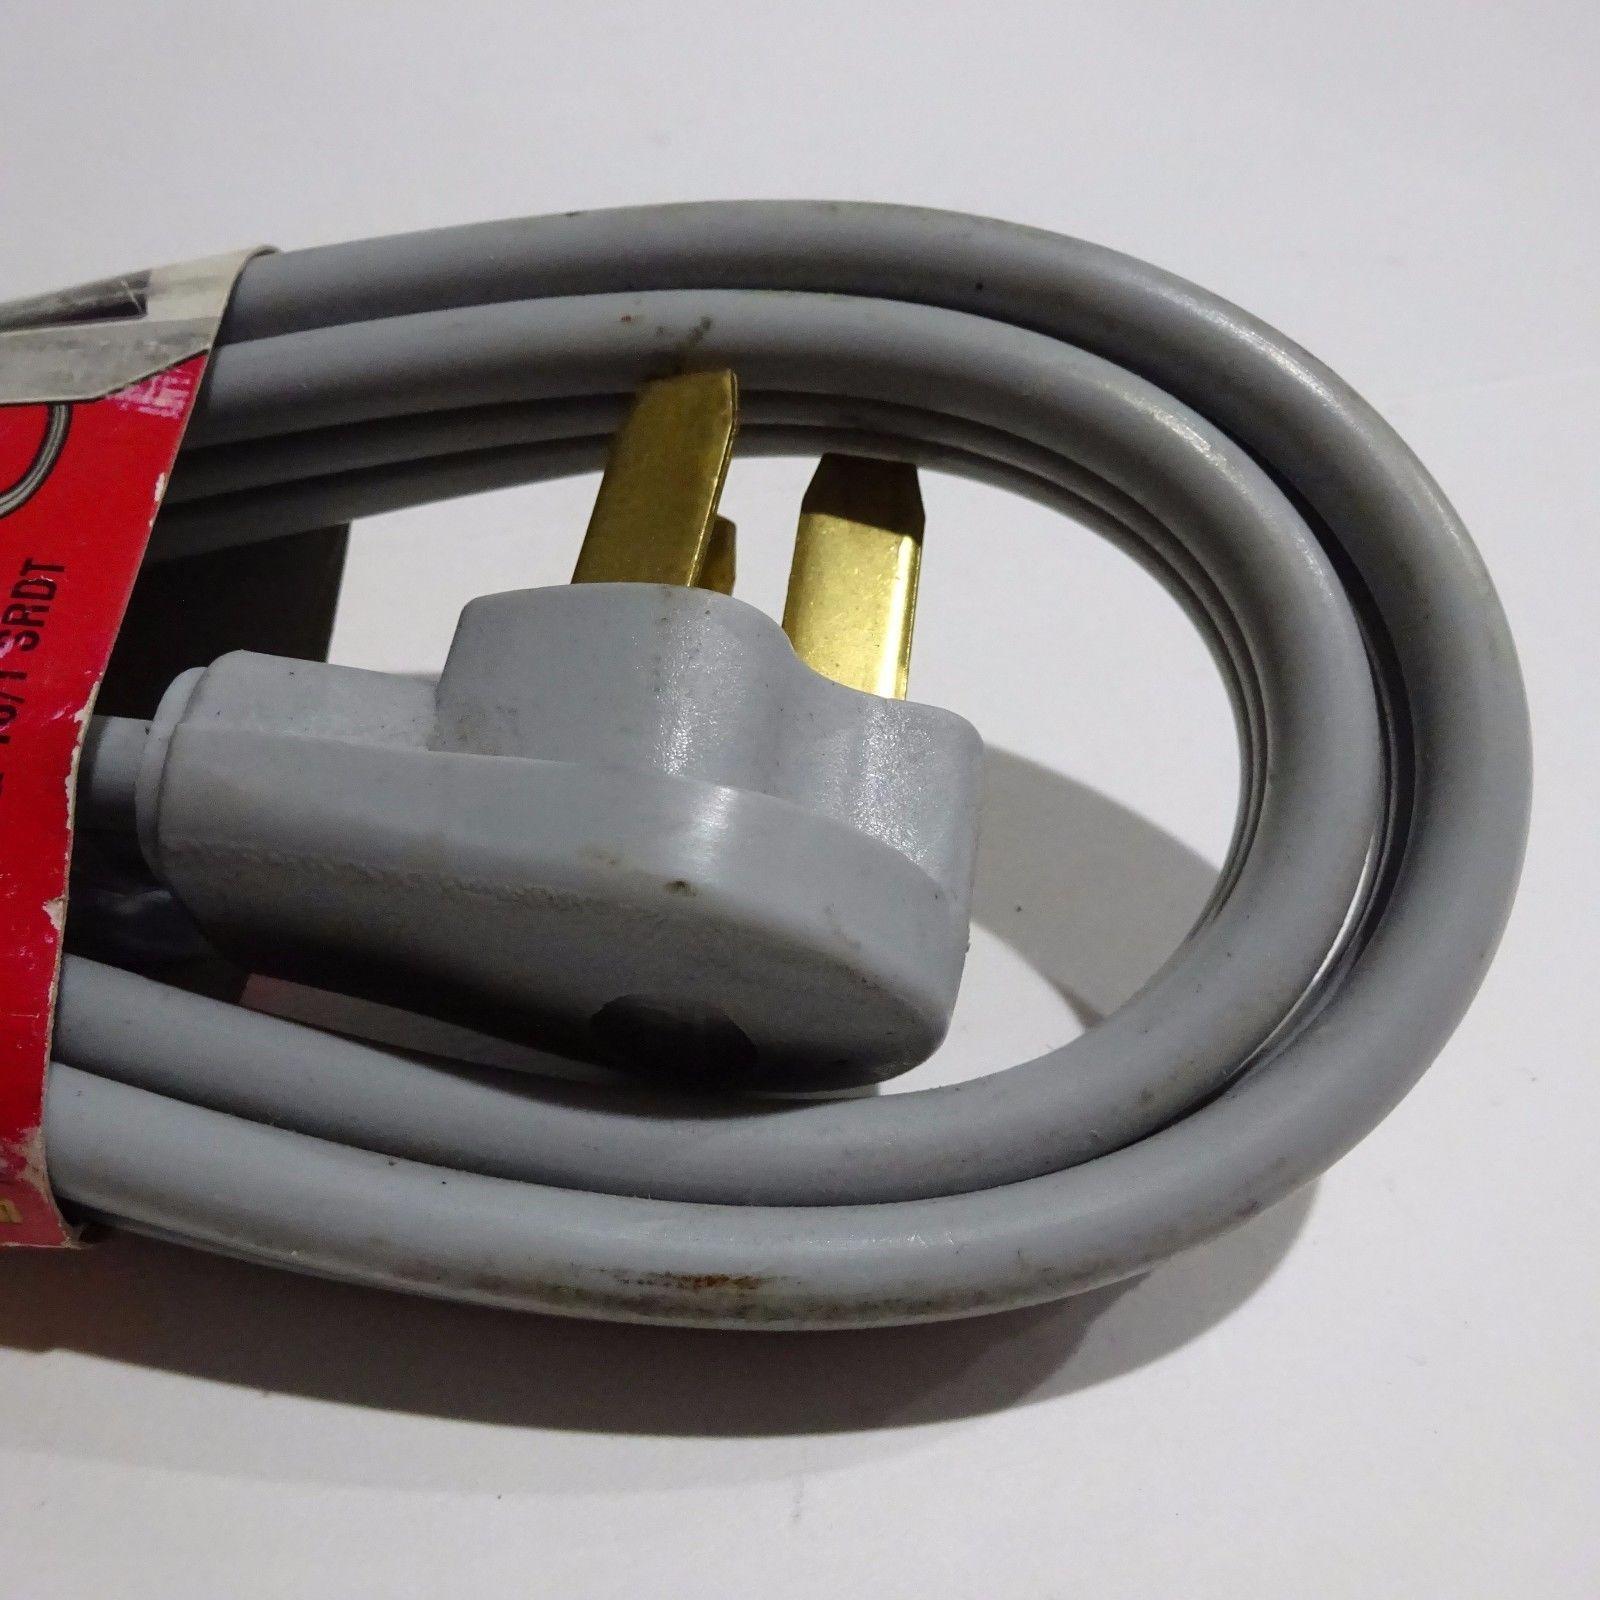 6ft 8/2 & 10/1 Gauge 40 Amp SRDT Type 3 Prime Wire Range Extension Cord Gray